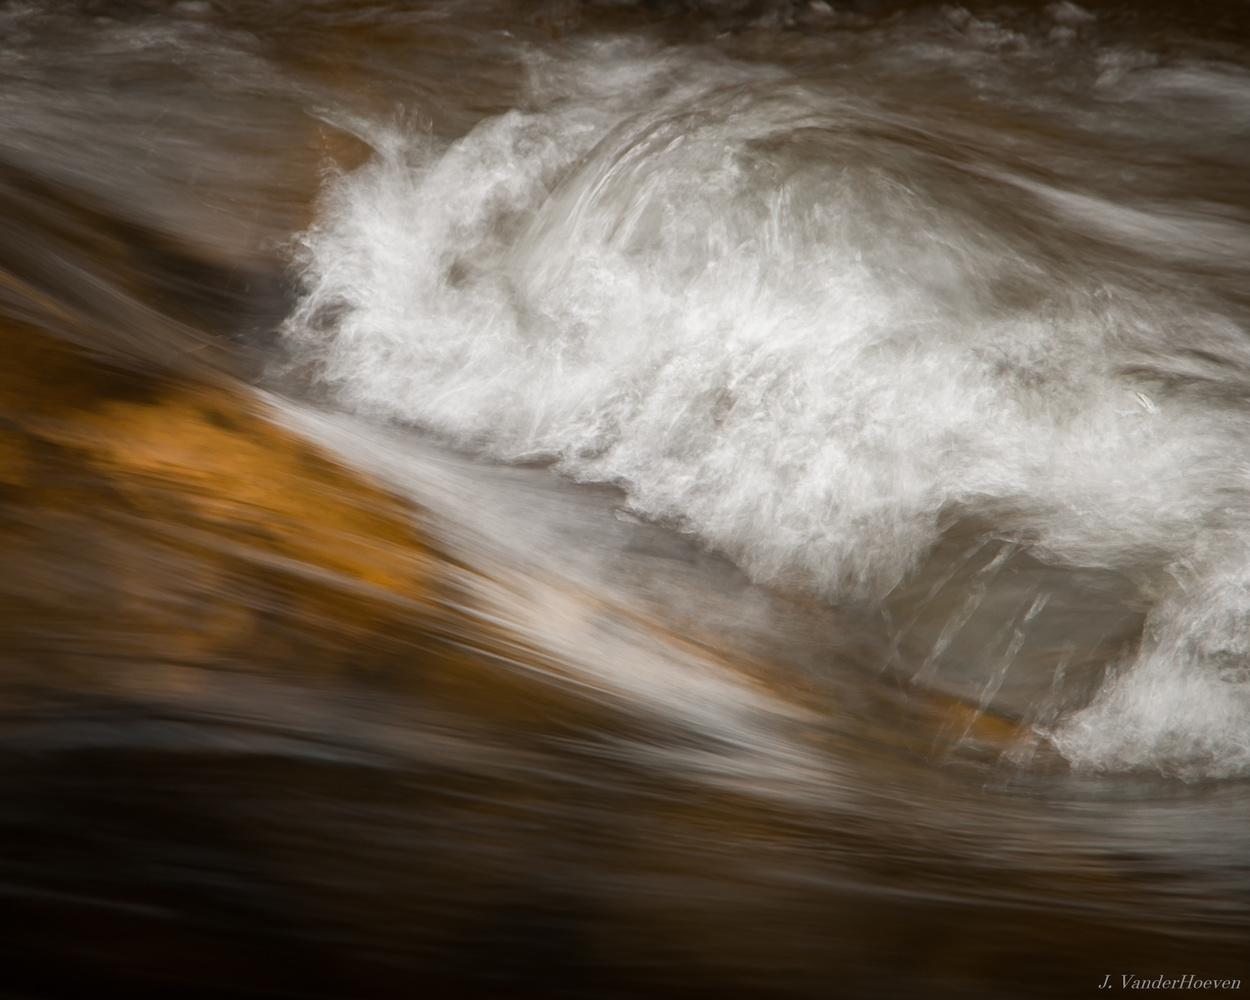 Ebb & Flow by Jake VanderHoeven